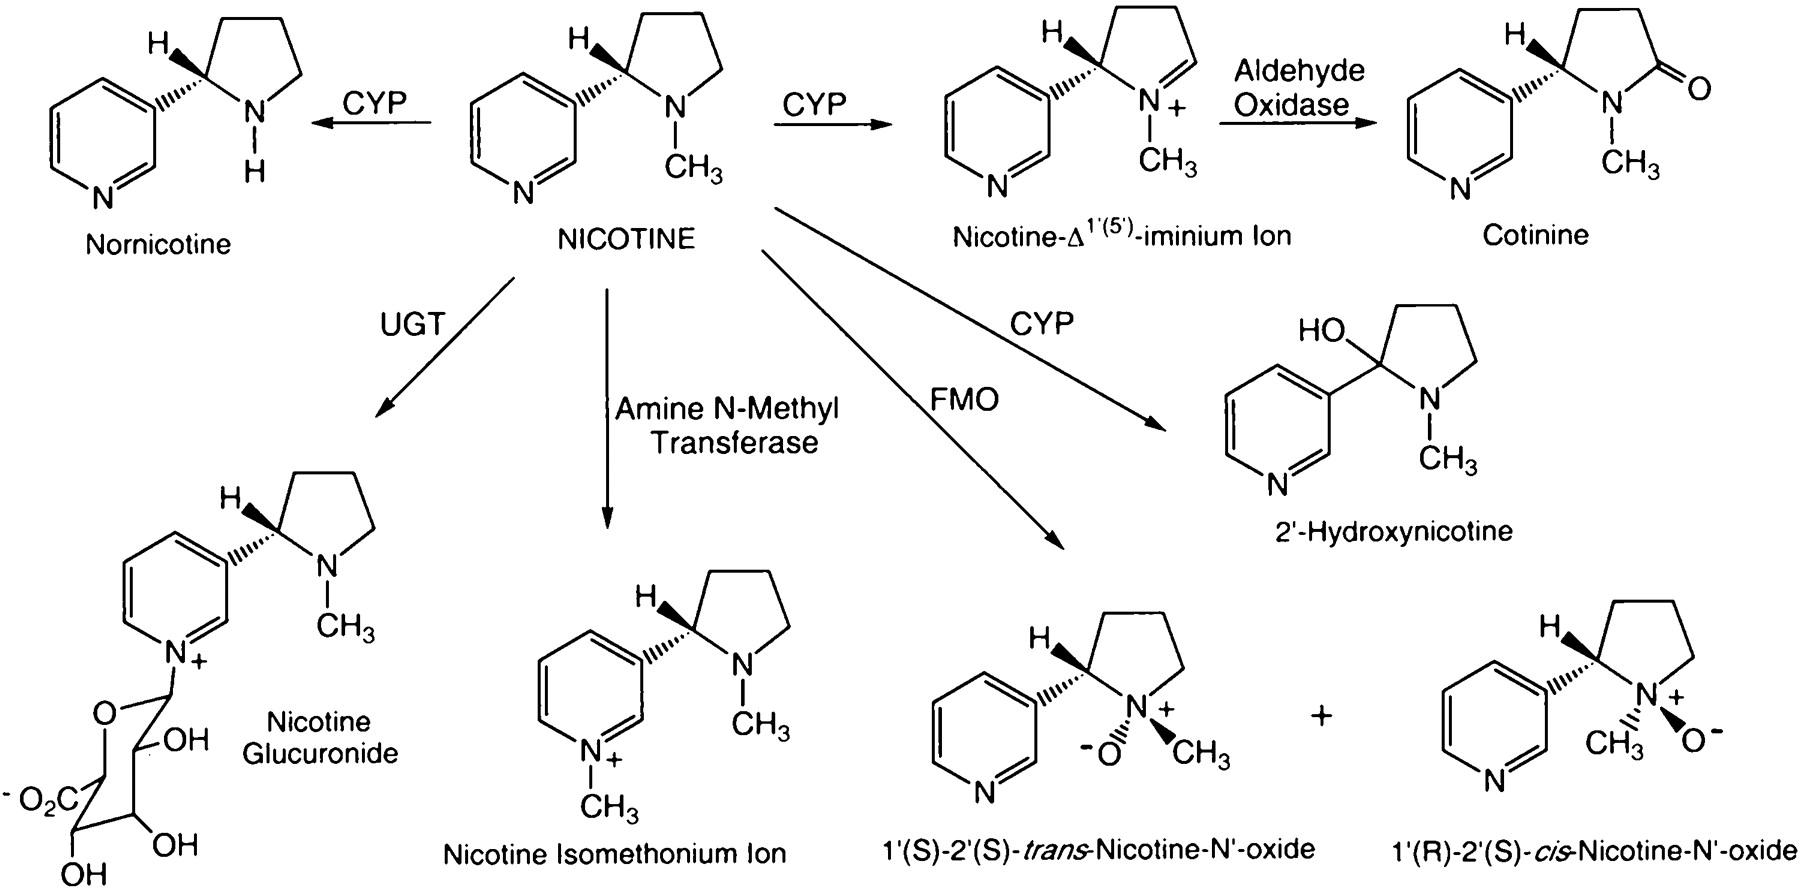 metabolism and disposition kinetics of nicotine